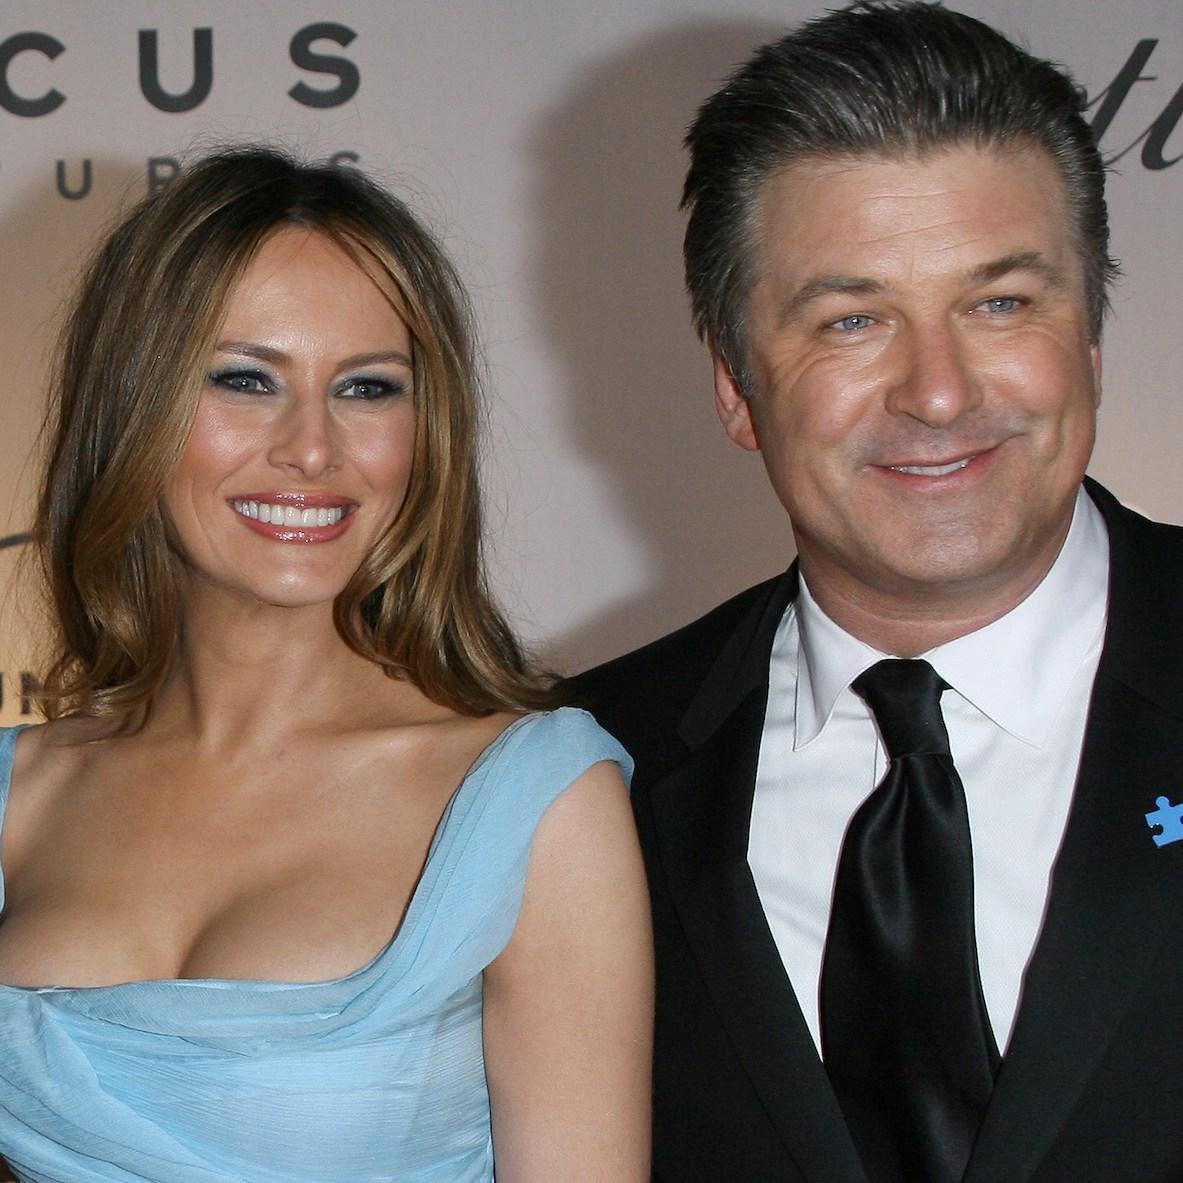 Melania Trump and Alec Baldwin